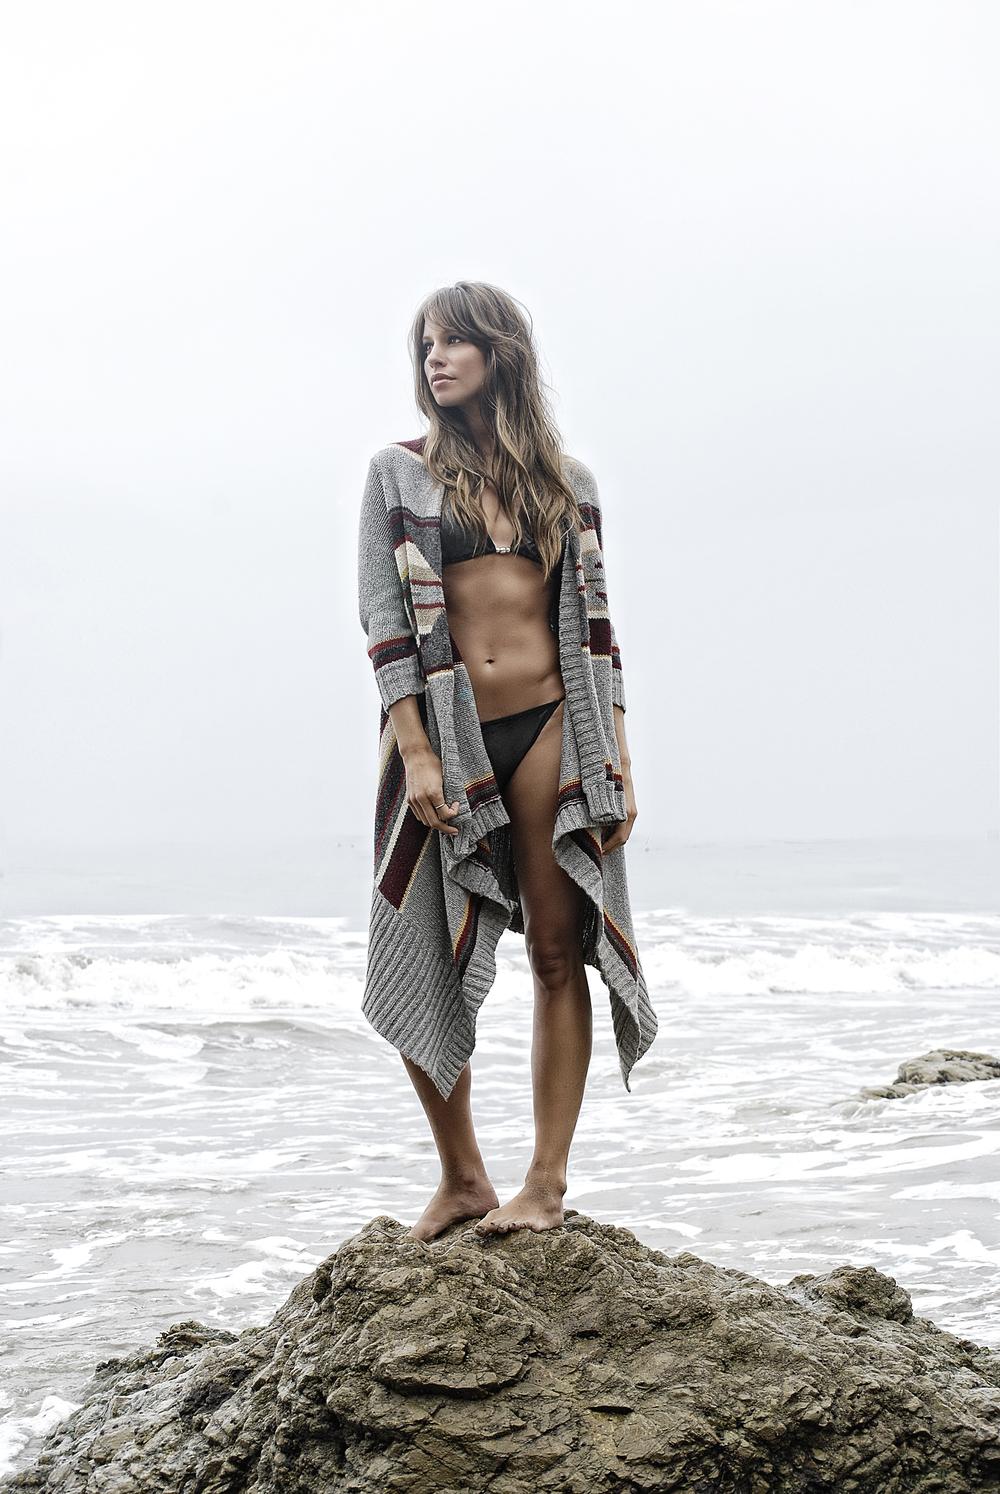 Jenn Korbee nudes (54 photo), Tits, Is a cute, Instagram, cleavage 2015